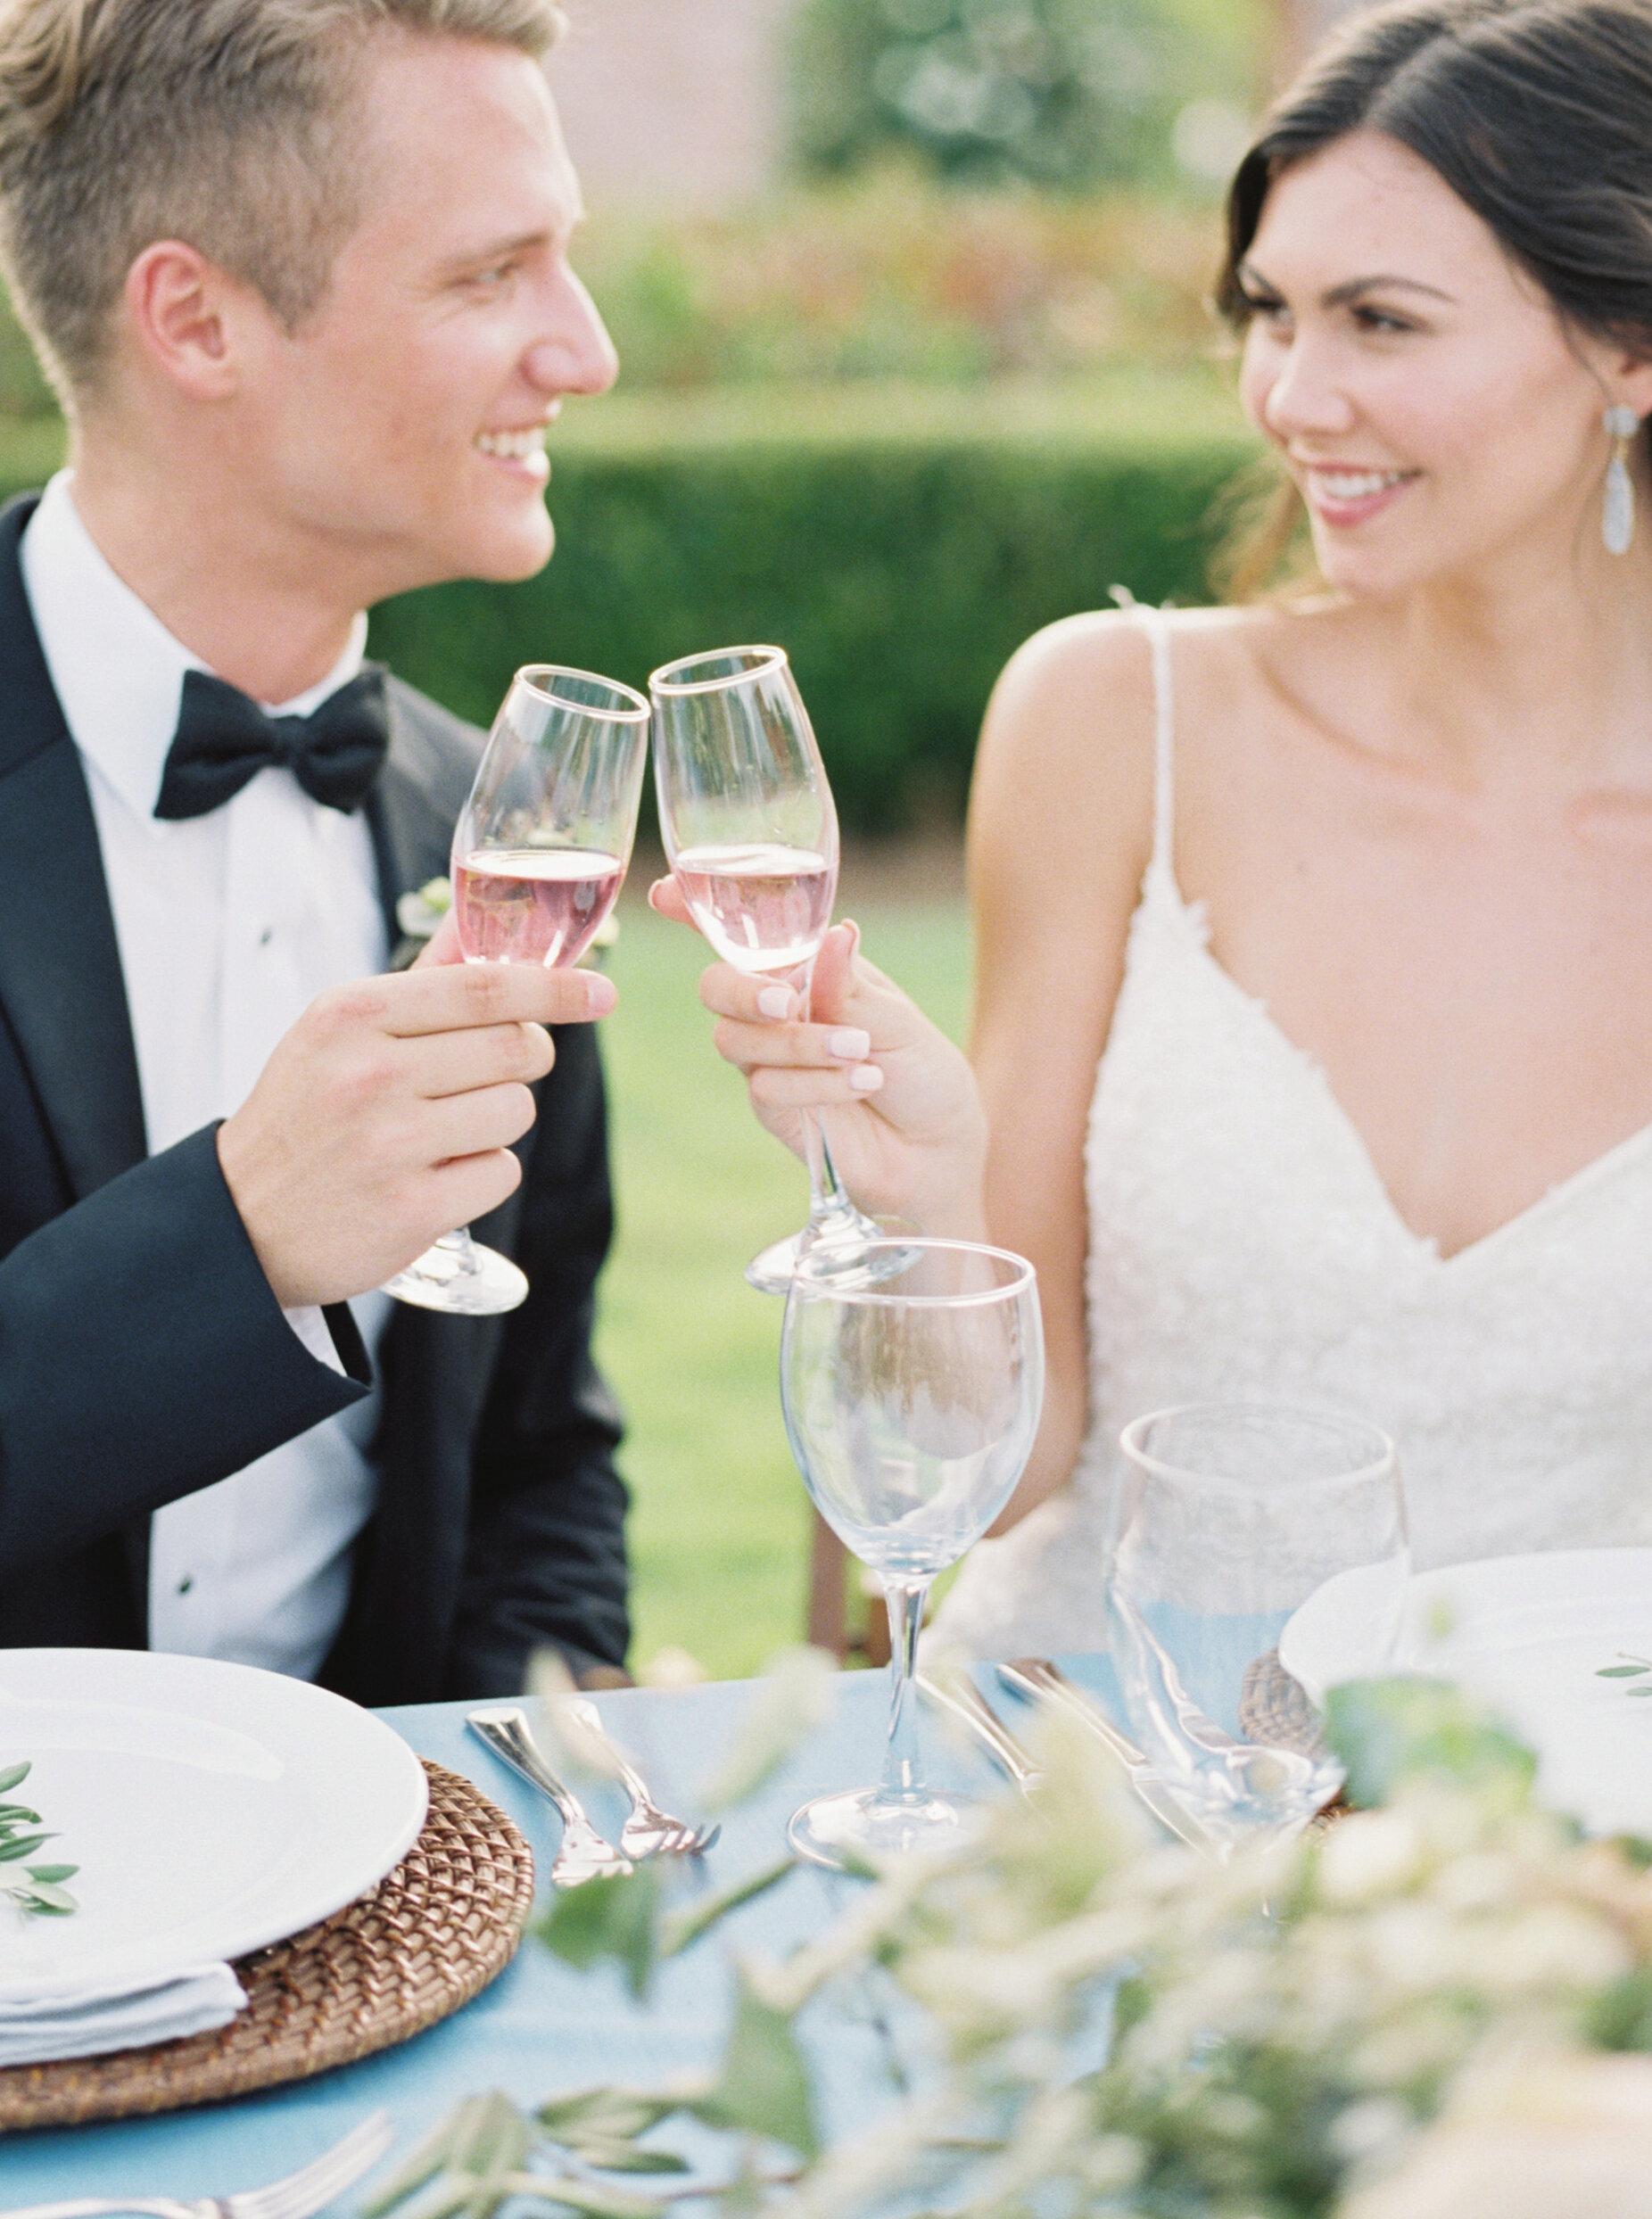 Bibb_Mill_Wedding_Editorial_Columbus_Georgia_Fallen_Photography_6-60.JPG